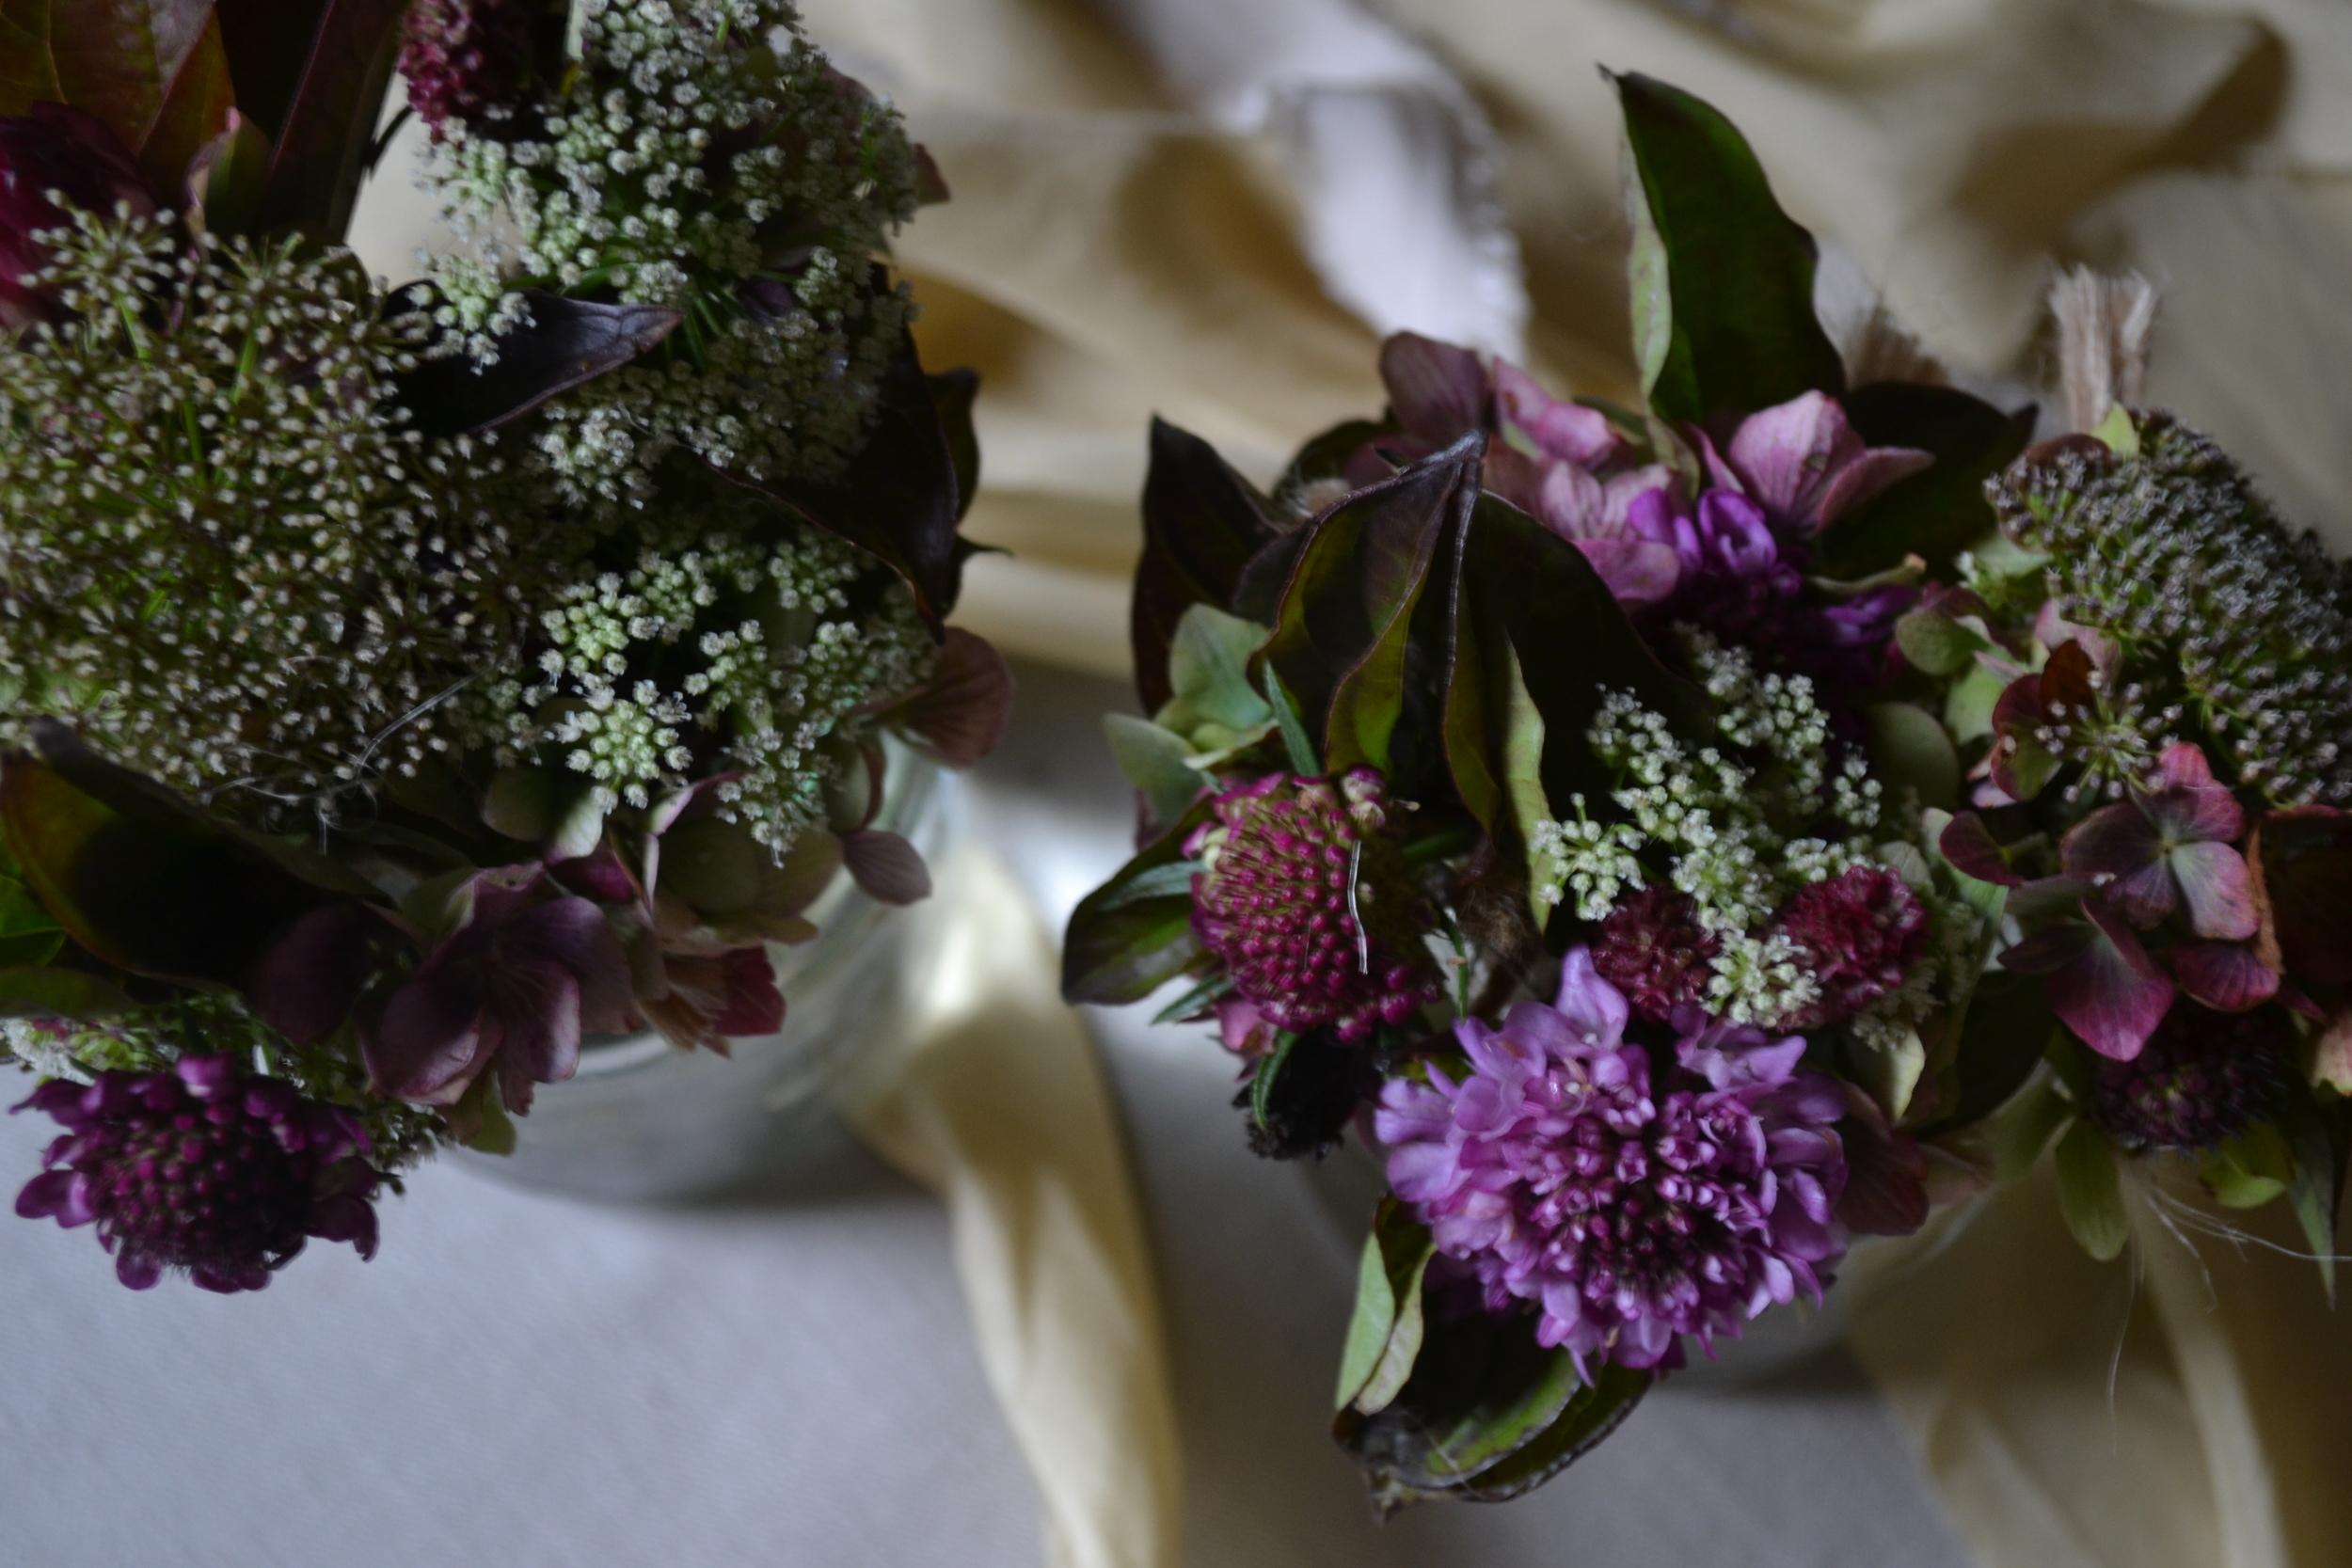 141024 - GG - Helens bridal flowers 044.JPG